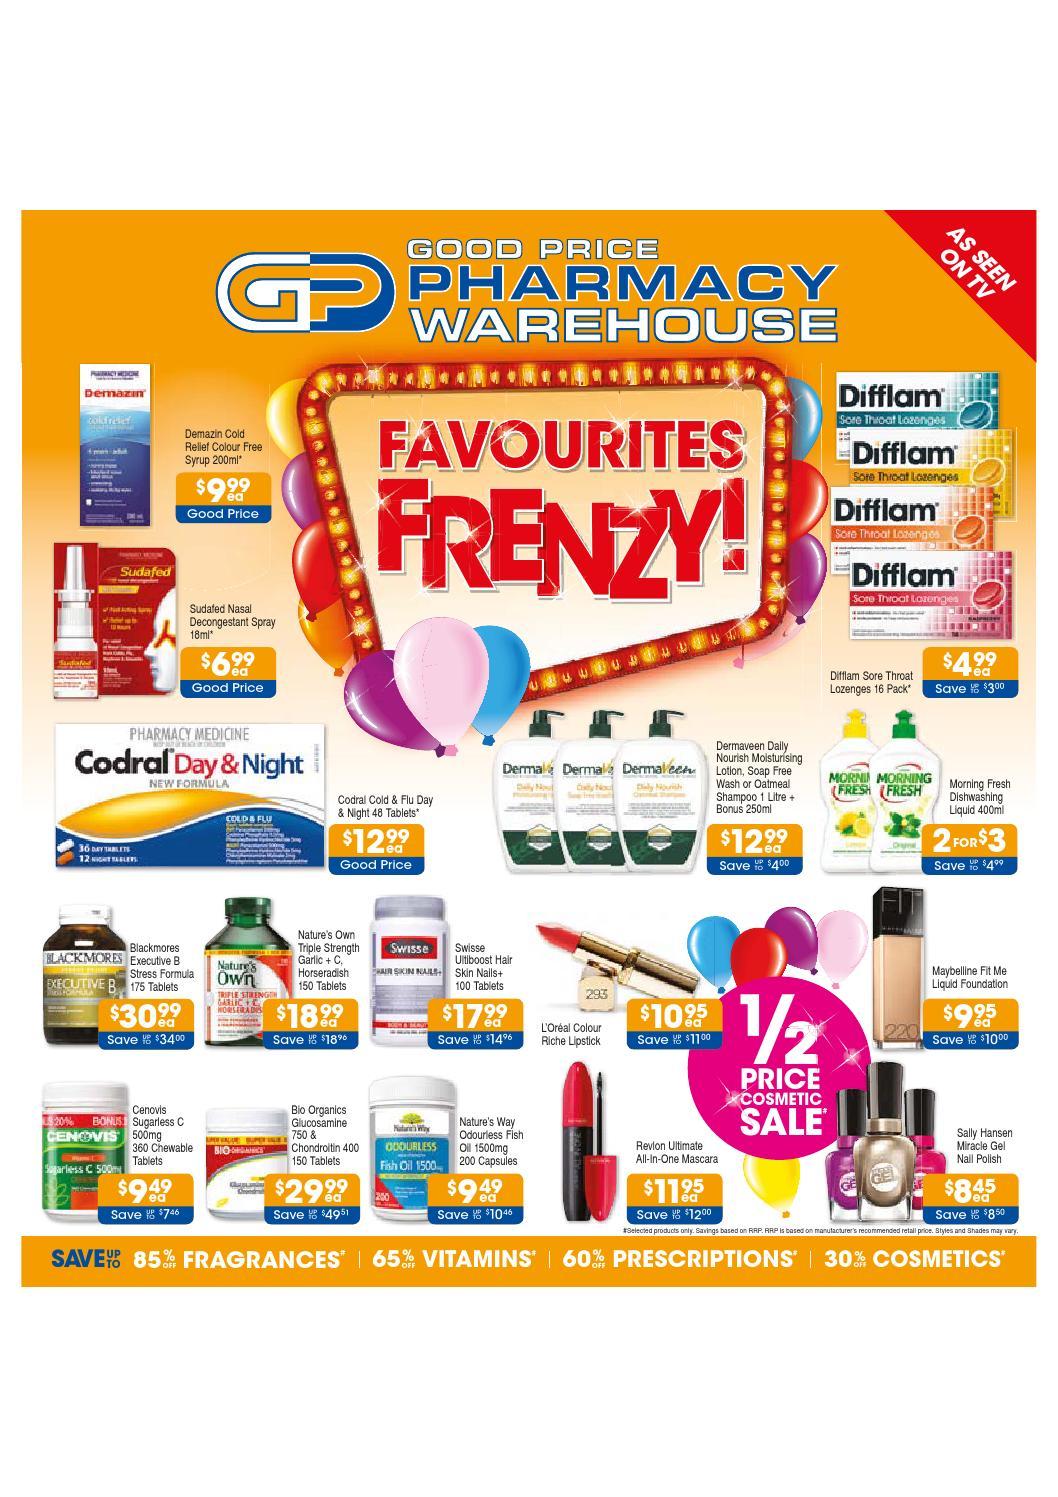 Harga Dan Spek Blackmores Bio C 1000mg 150 Capsules Update 2018 Tablets Good Price Pharmacy Warehouse Catalogue By Nexus Issuu